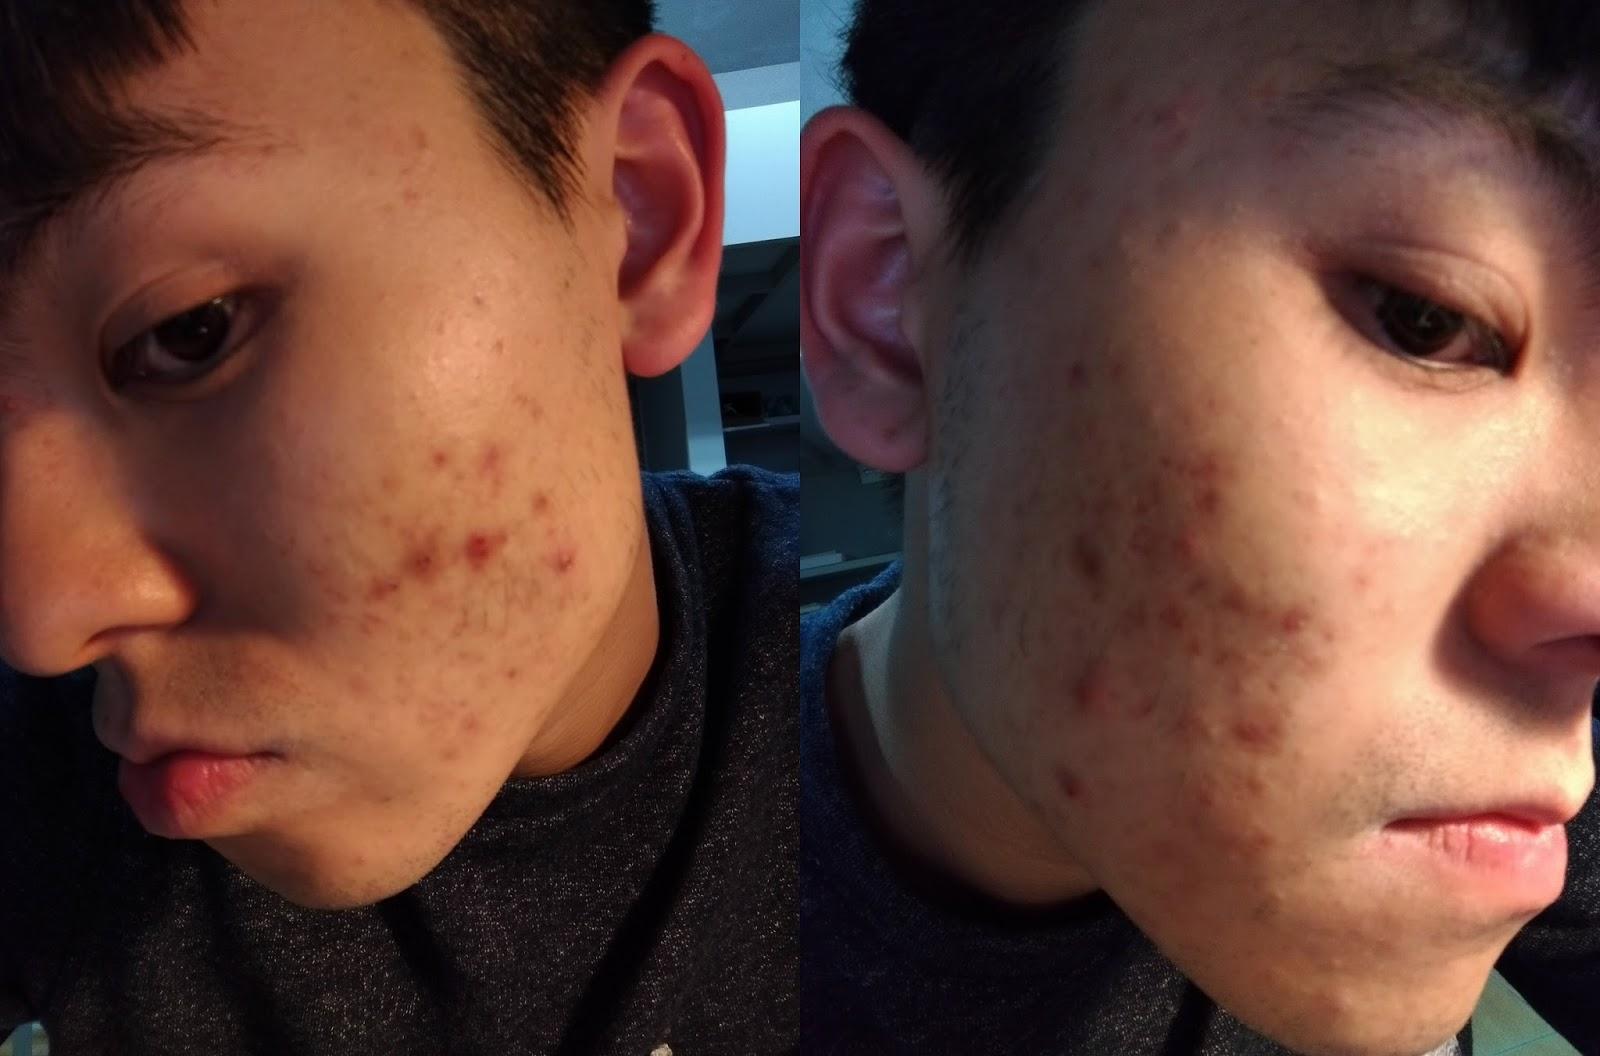 P 20170303 212752 - [心得] 台南林炳煌皮膚科 - 痘痘看診、初診心得